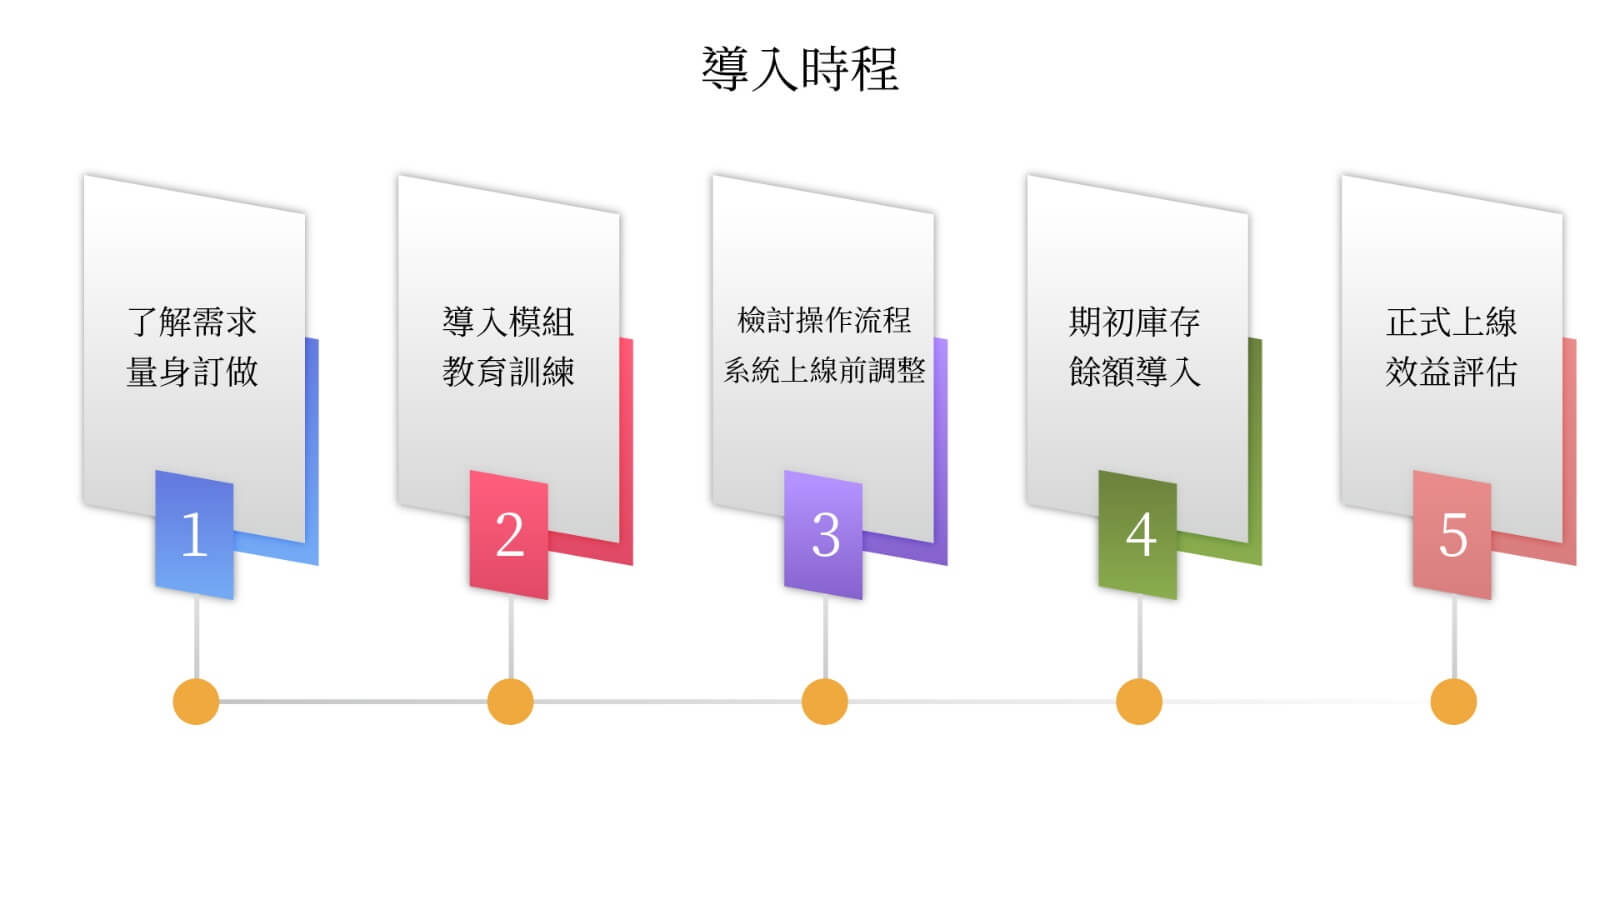 ERP for 購物商城文案 7